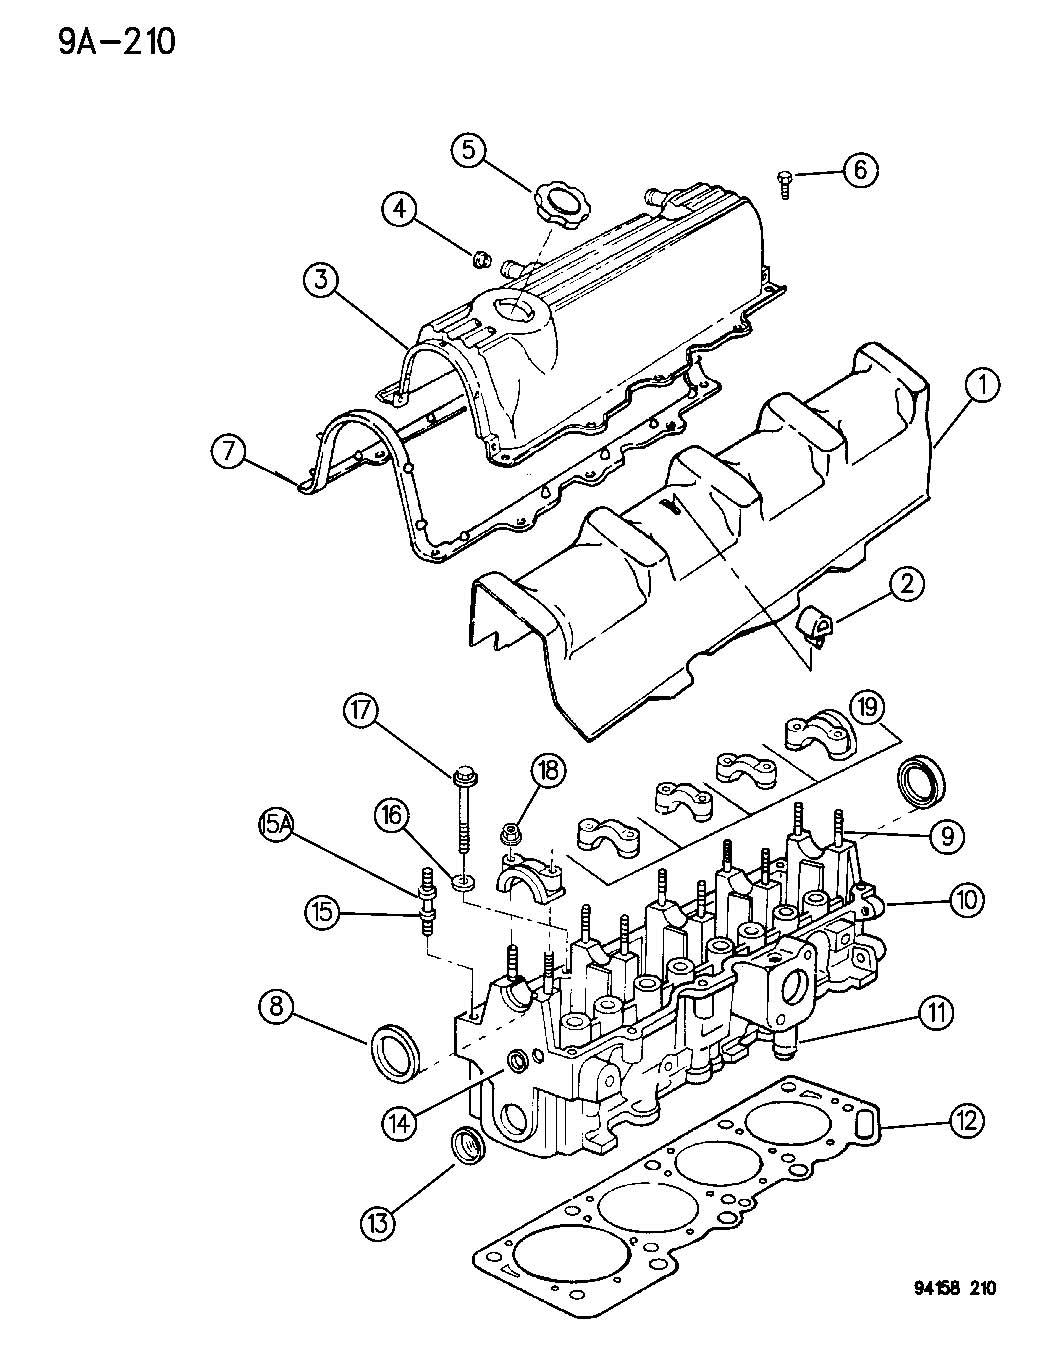 1995 chrysler sebring head bolt removal diagram